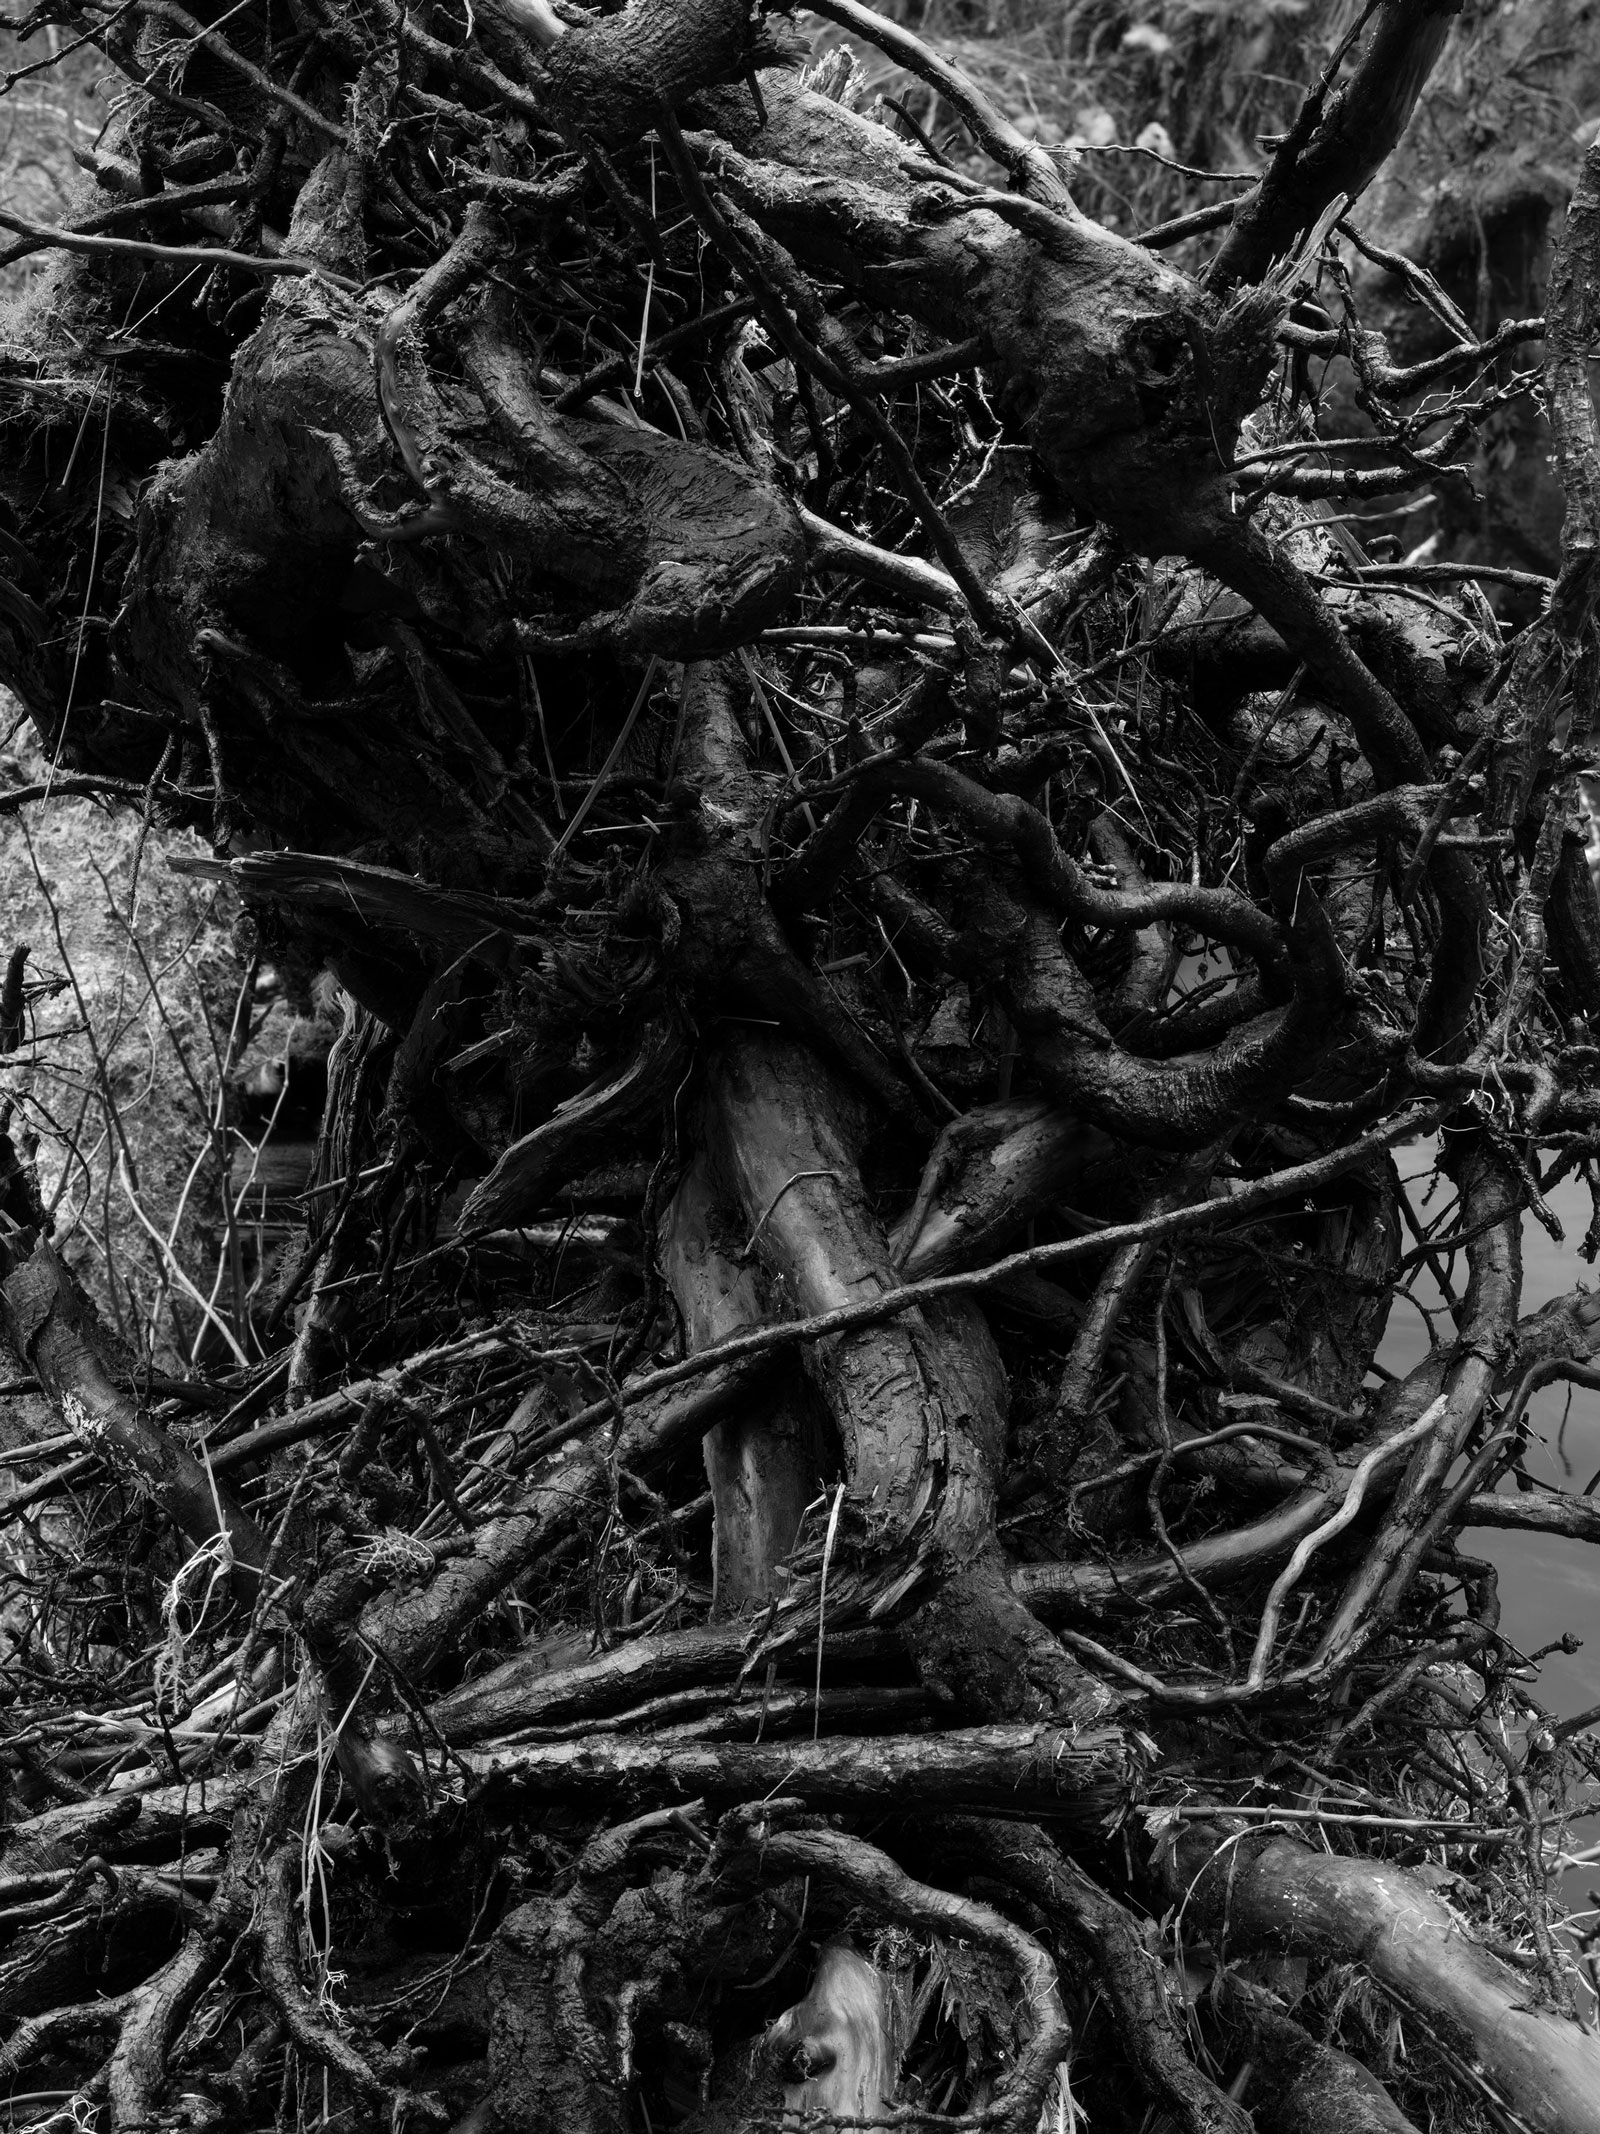 forest_floor_119_42x31.5